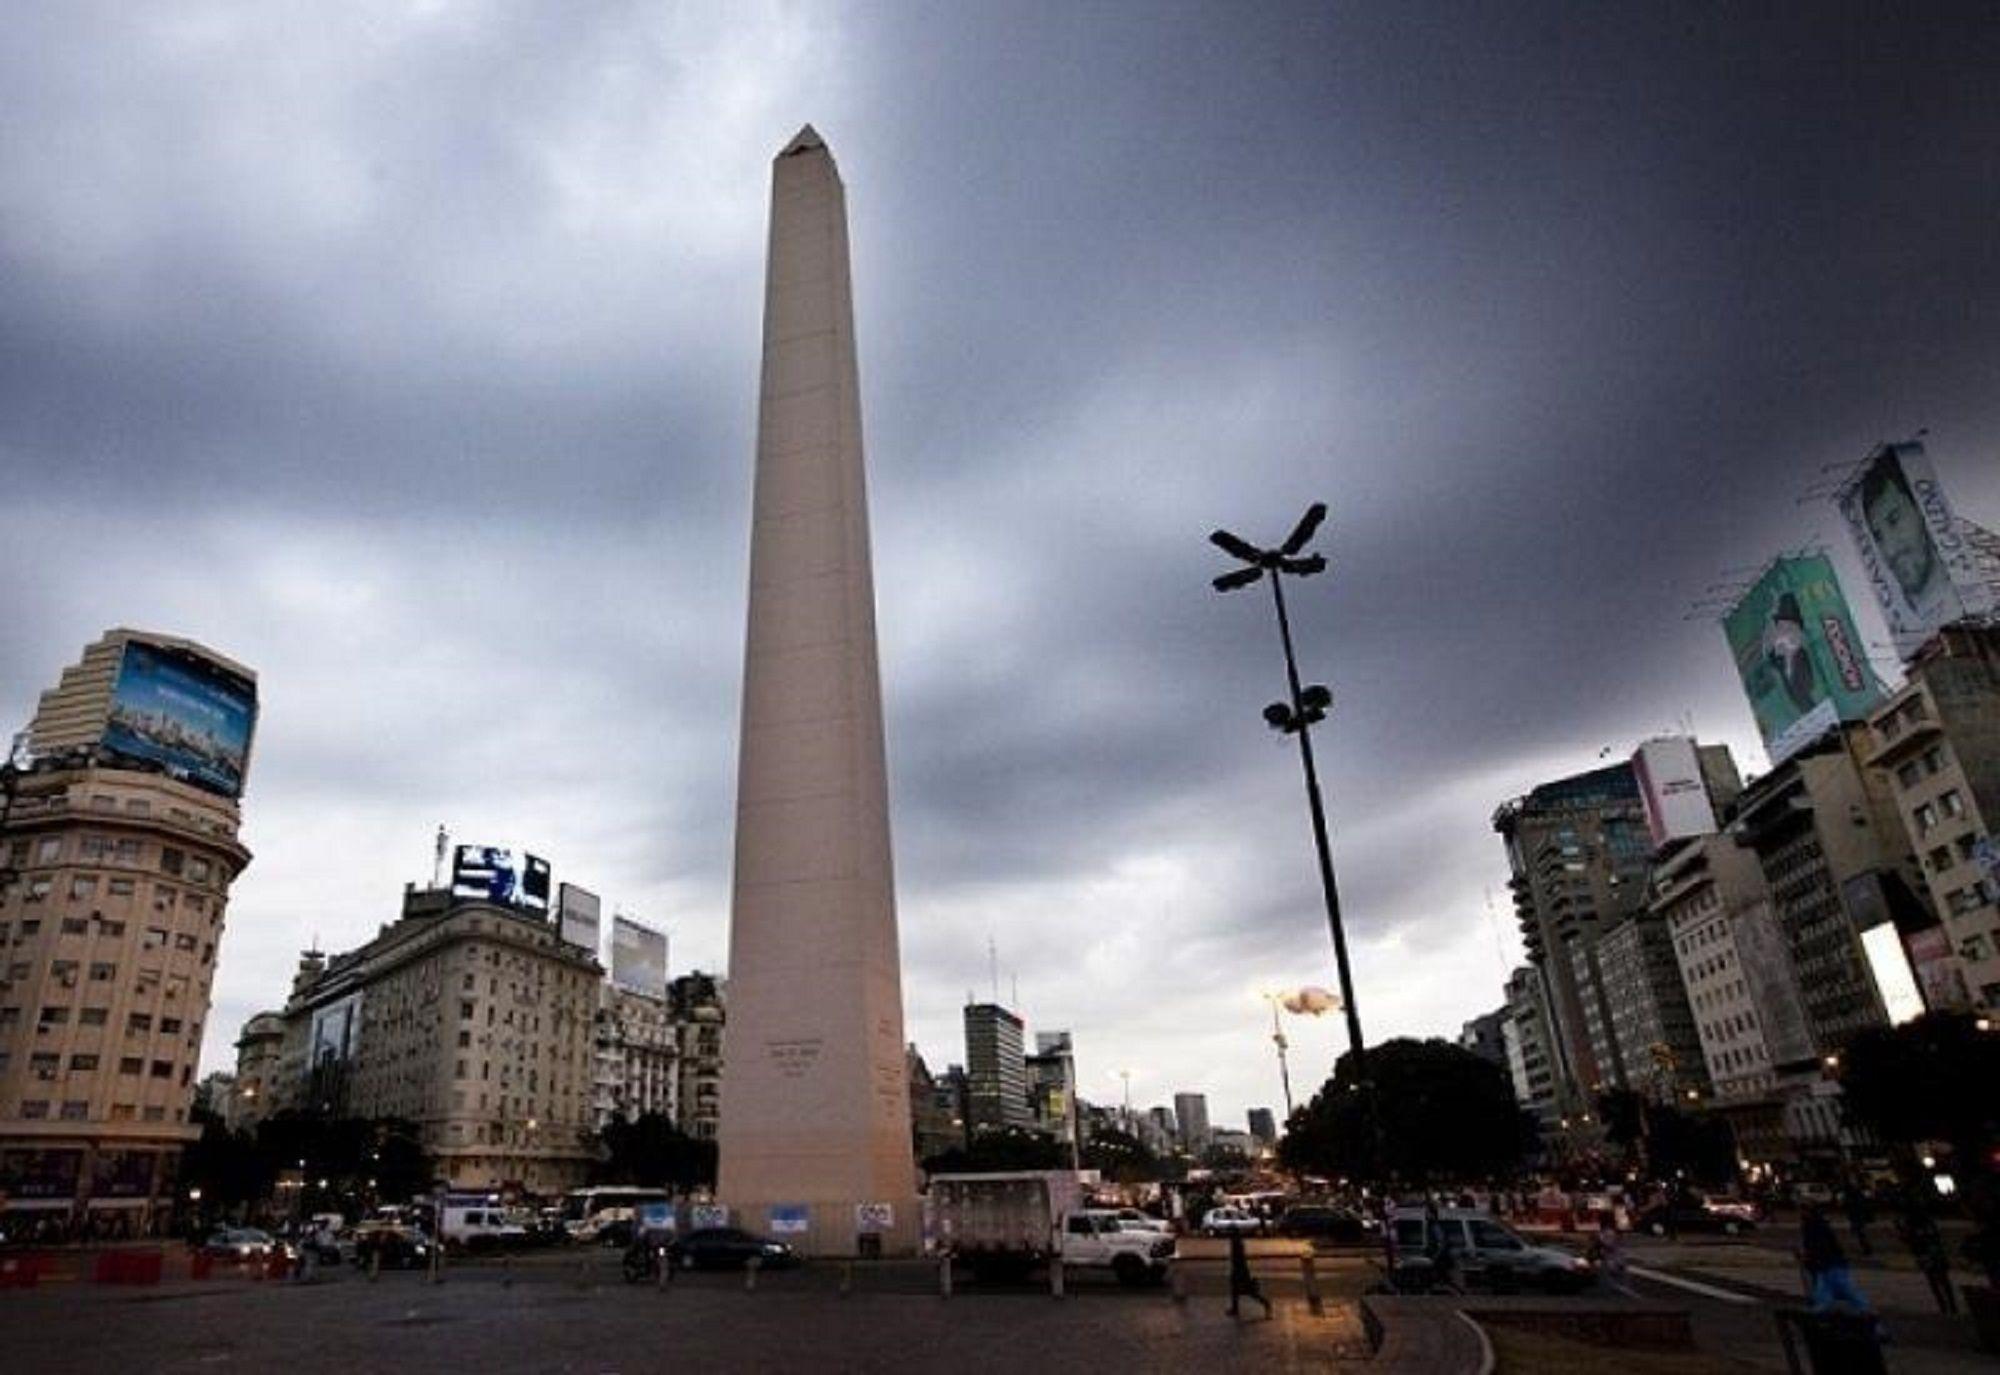 Después de la tormenta, ¿cómo va a estar el clima el fin de semana en Buenos Aires?